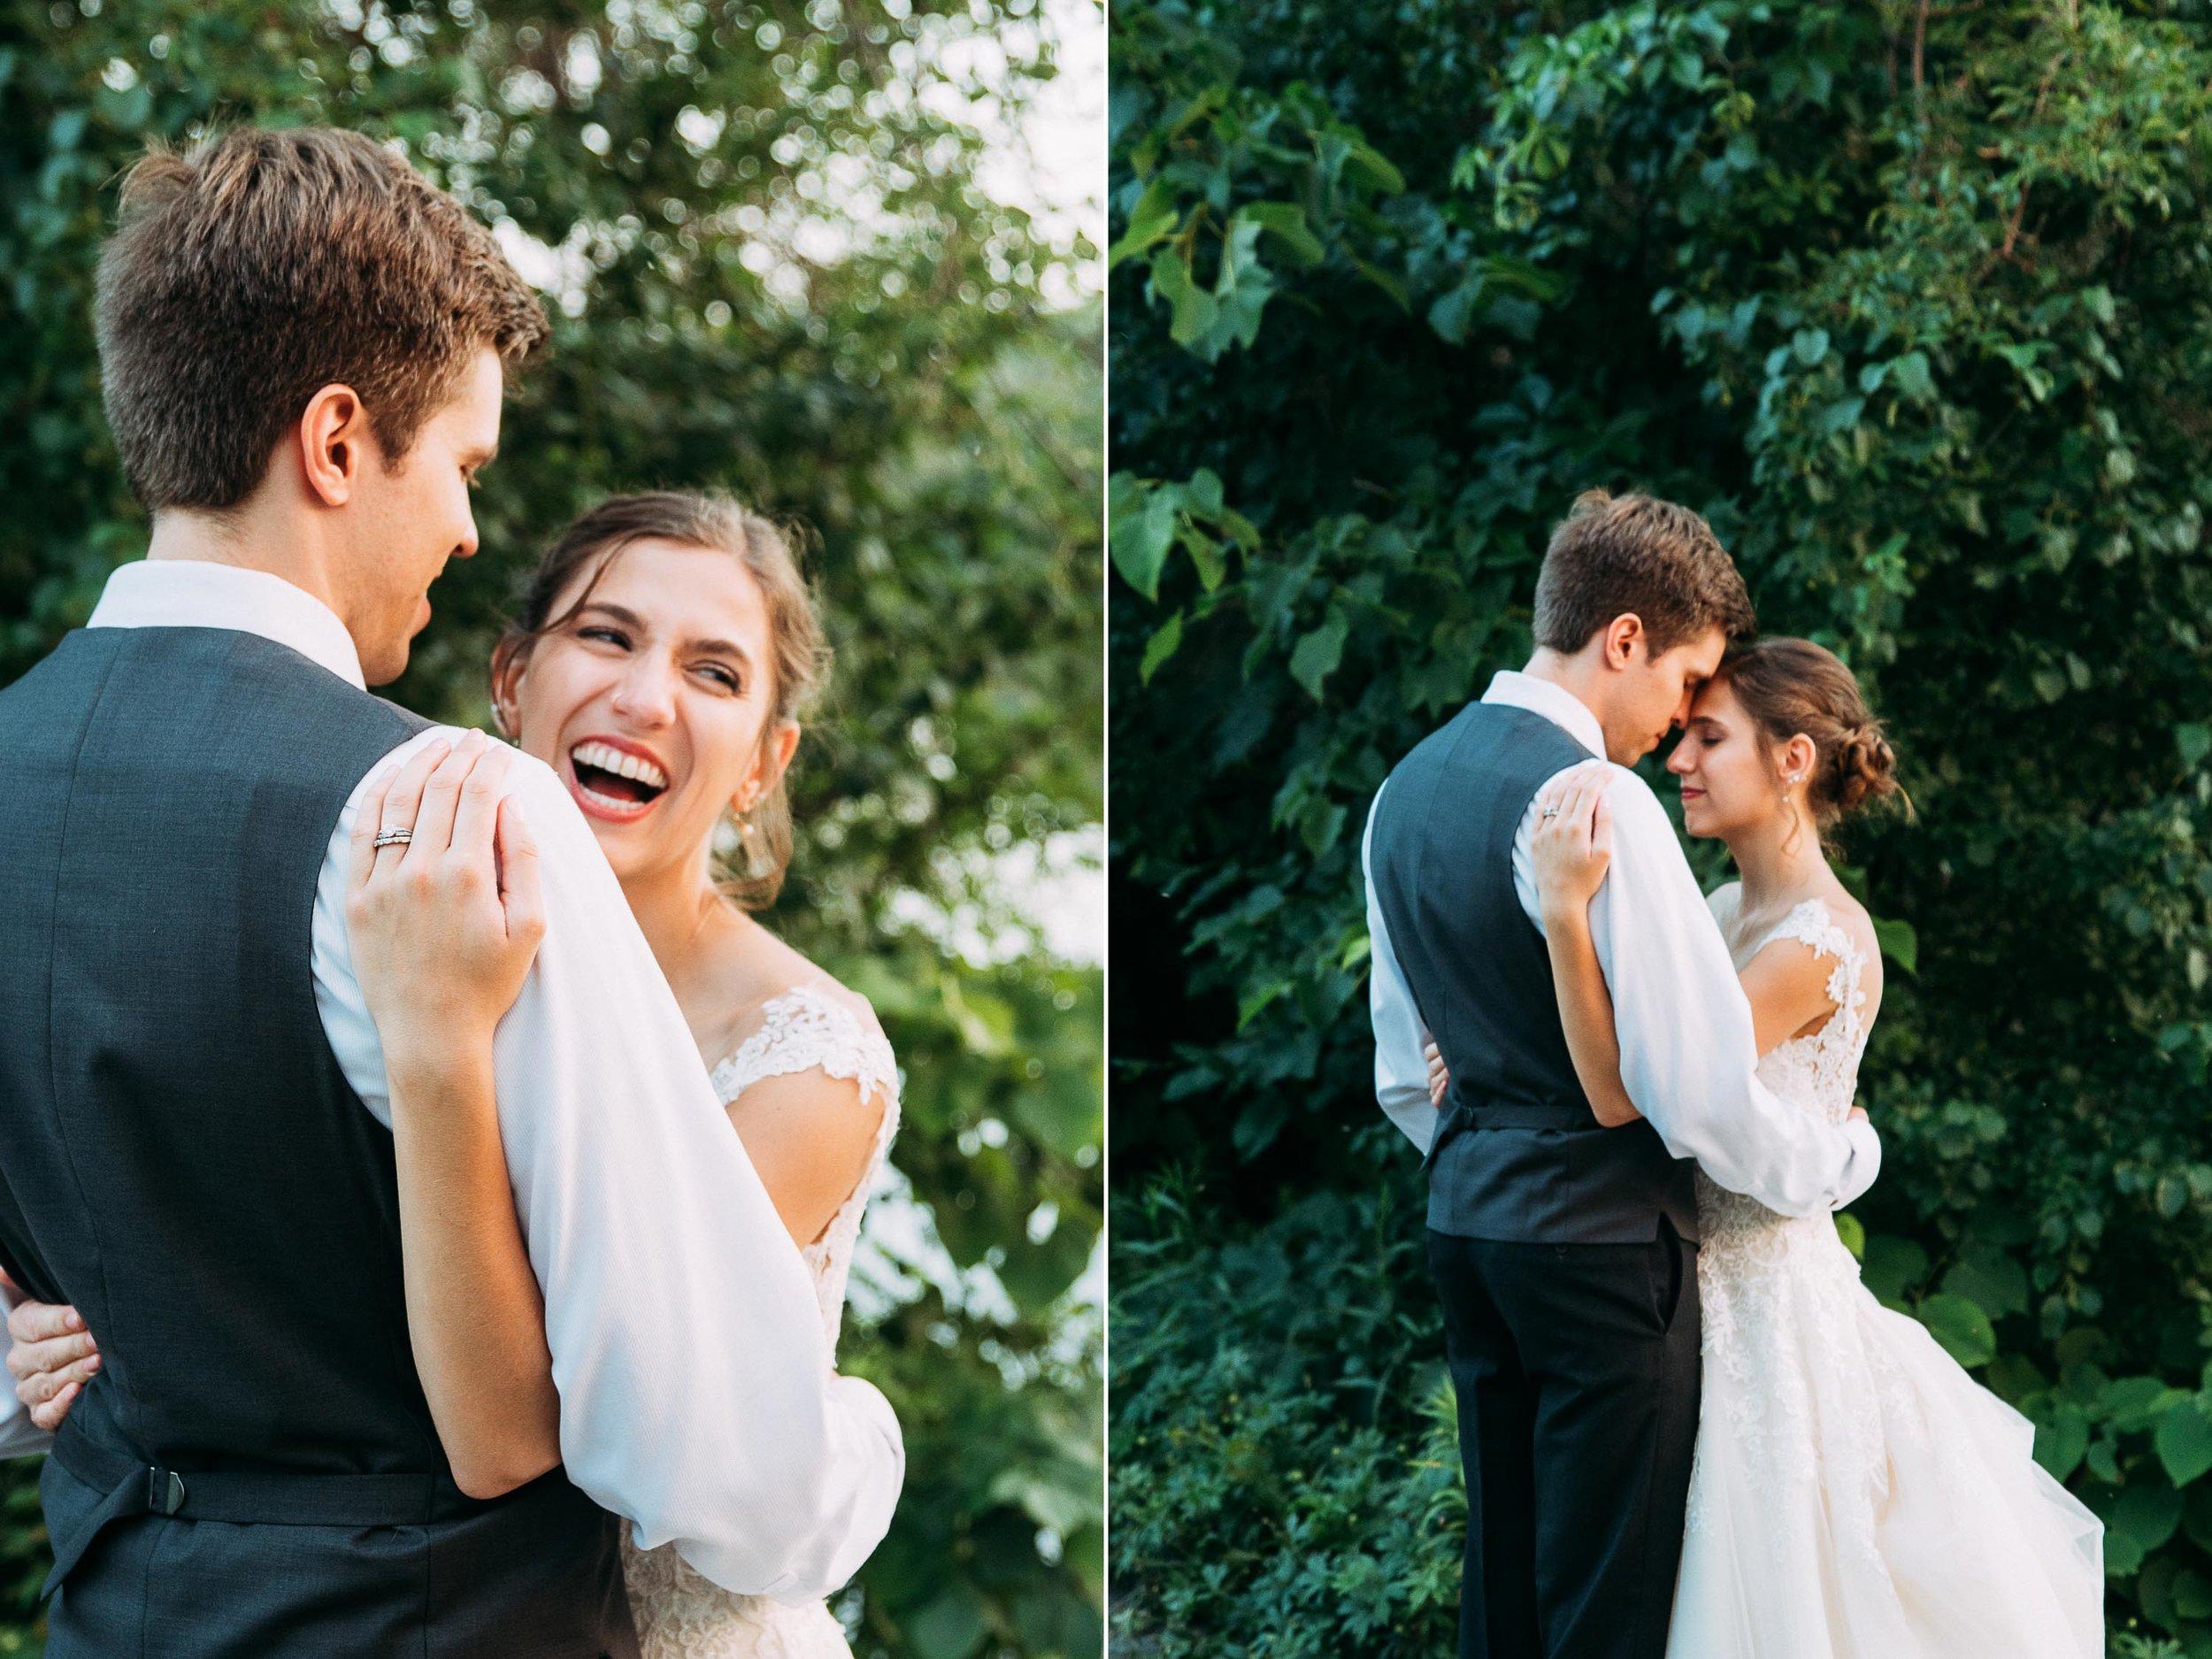 51-Liza_Chris_Minneapolis_Minnesota_Wedding.jpg